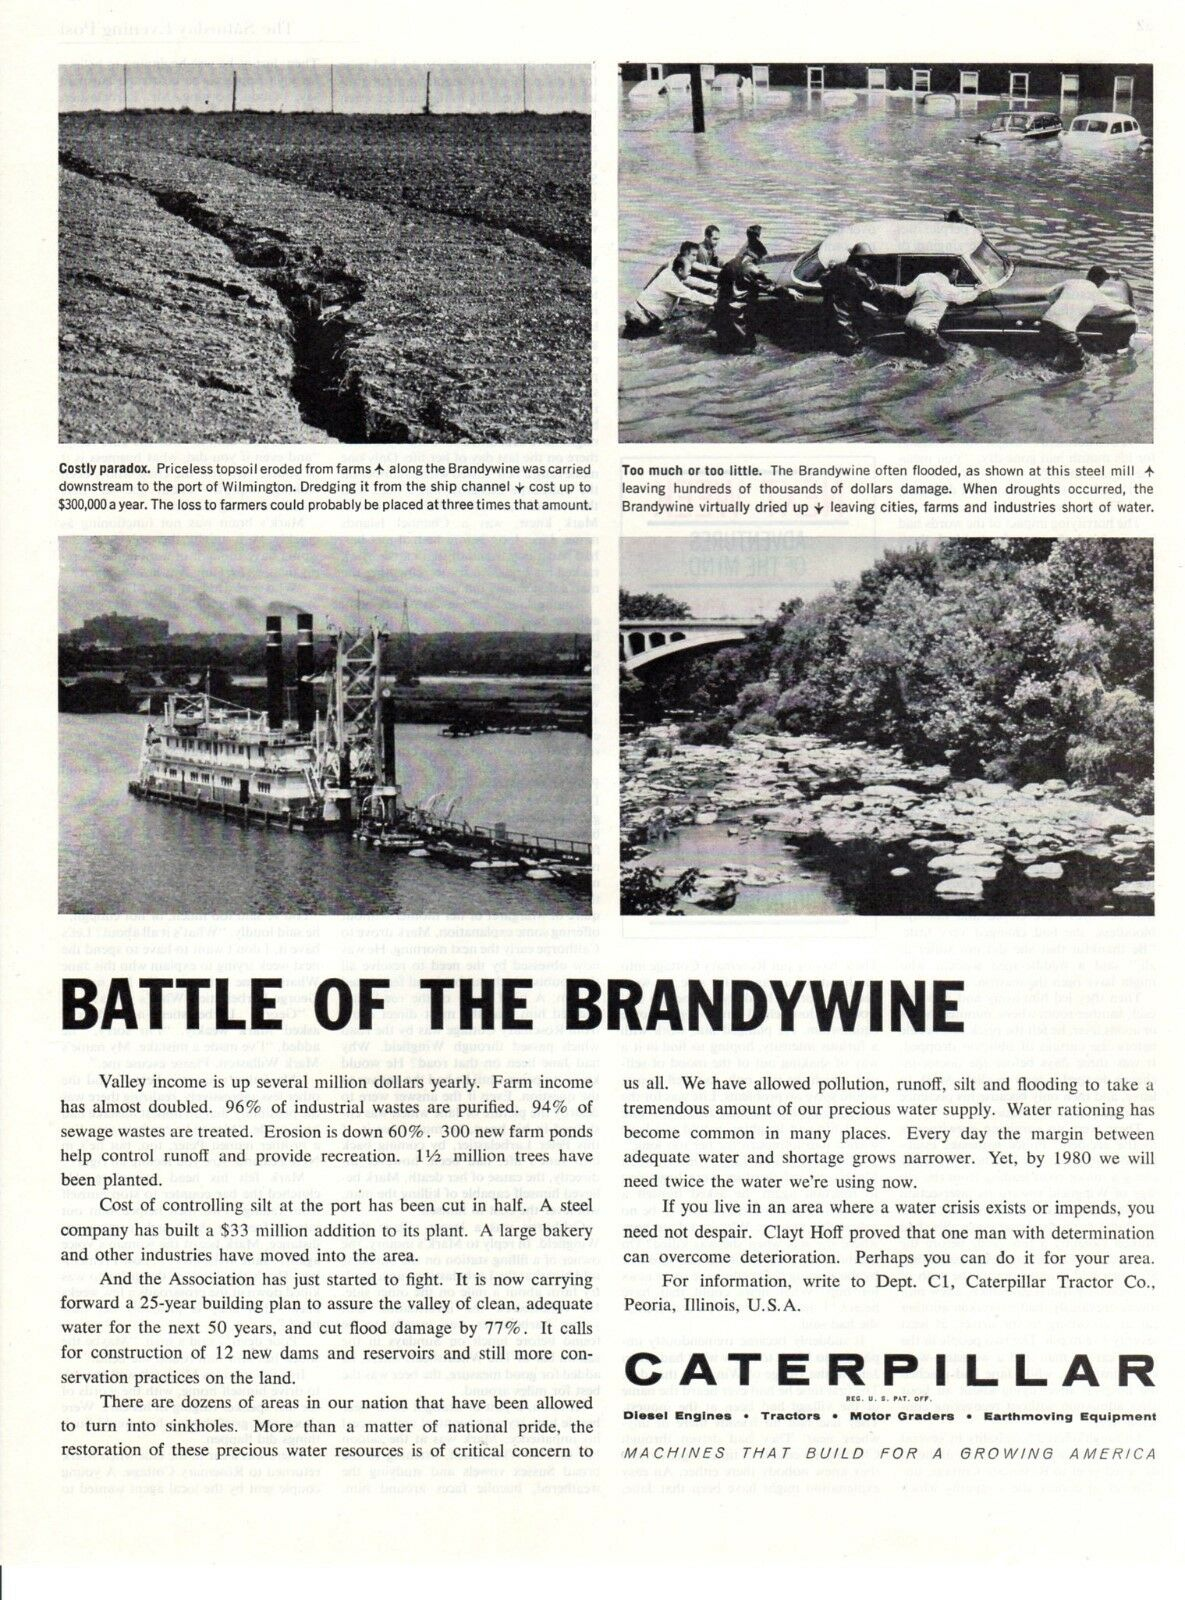 Vintage automobile Print car ad Caterpillar Tractor Battle of the Brandywine 61